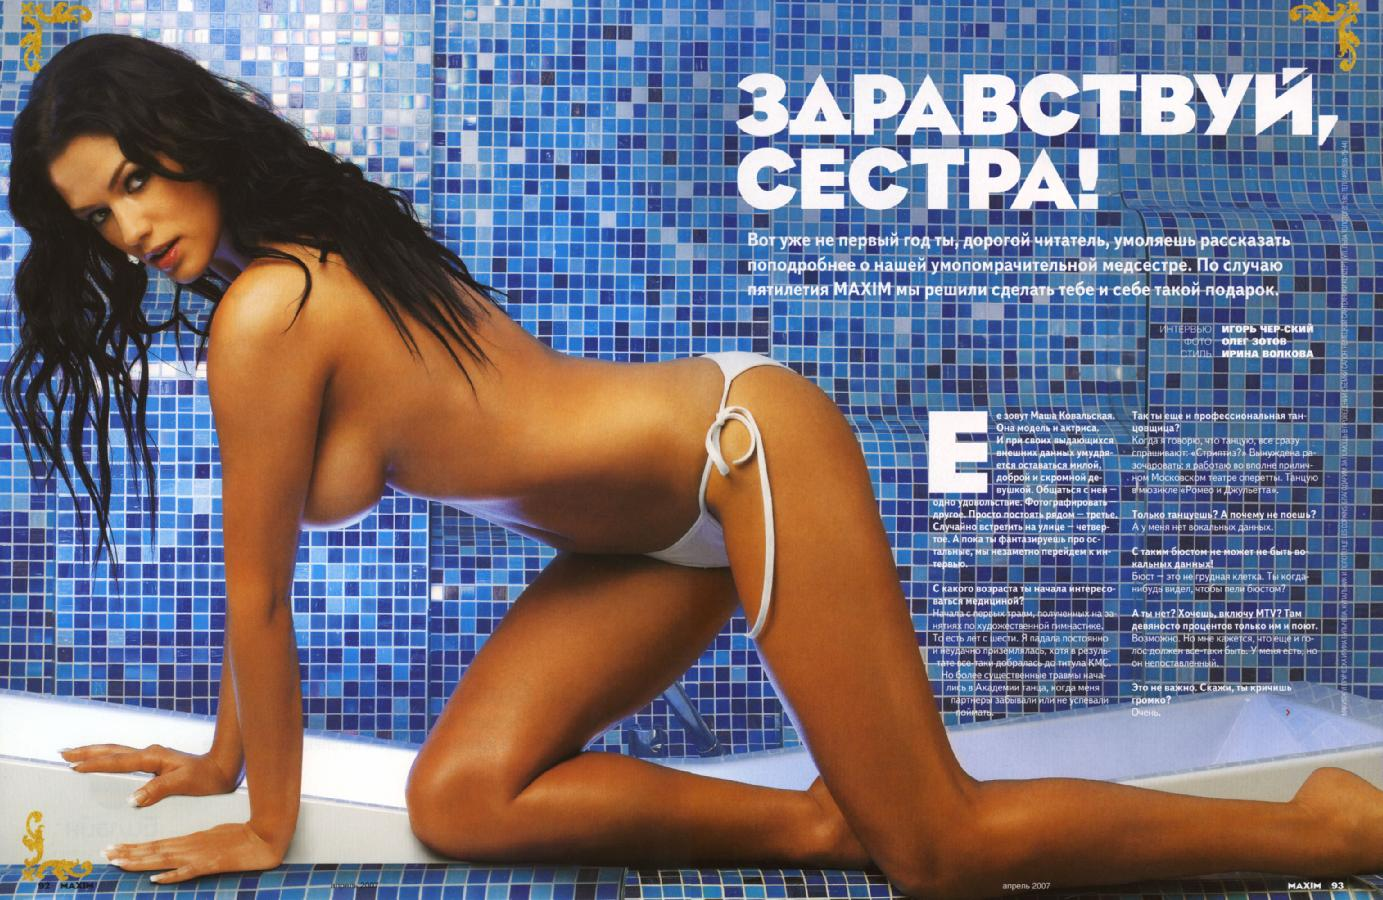 кировские девушки знакомства бес платно